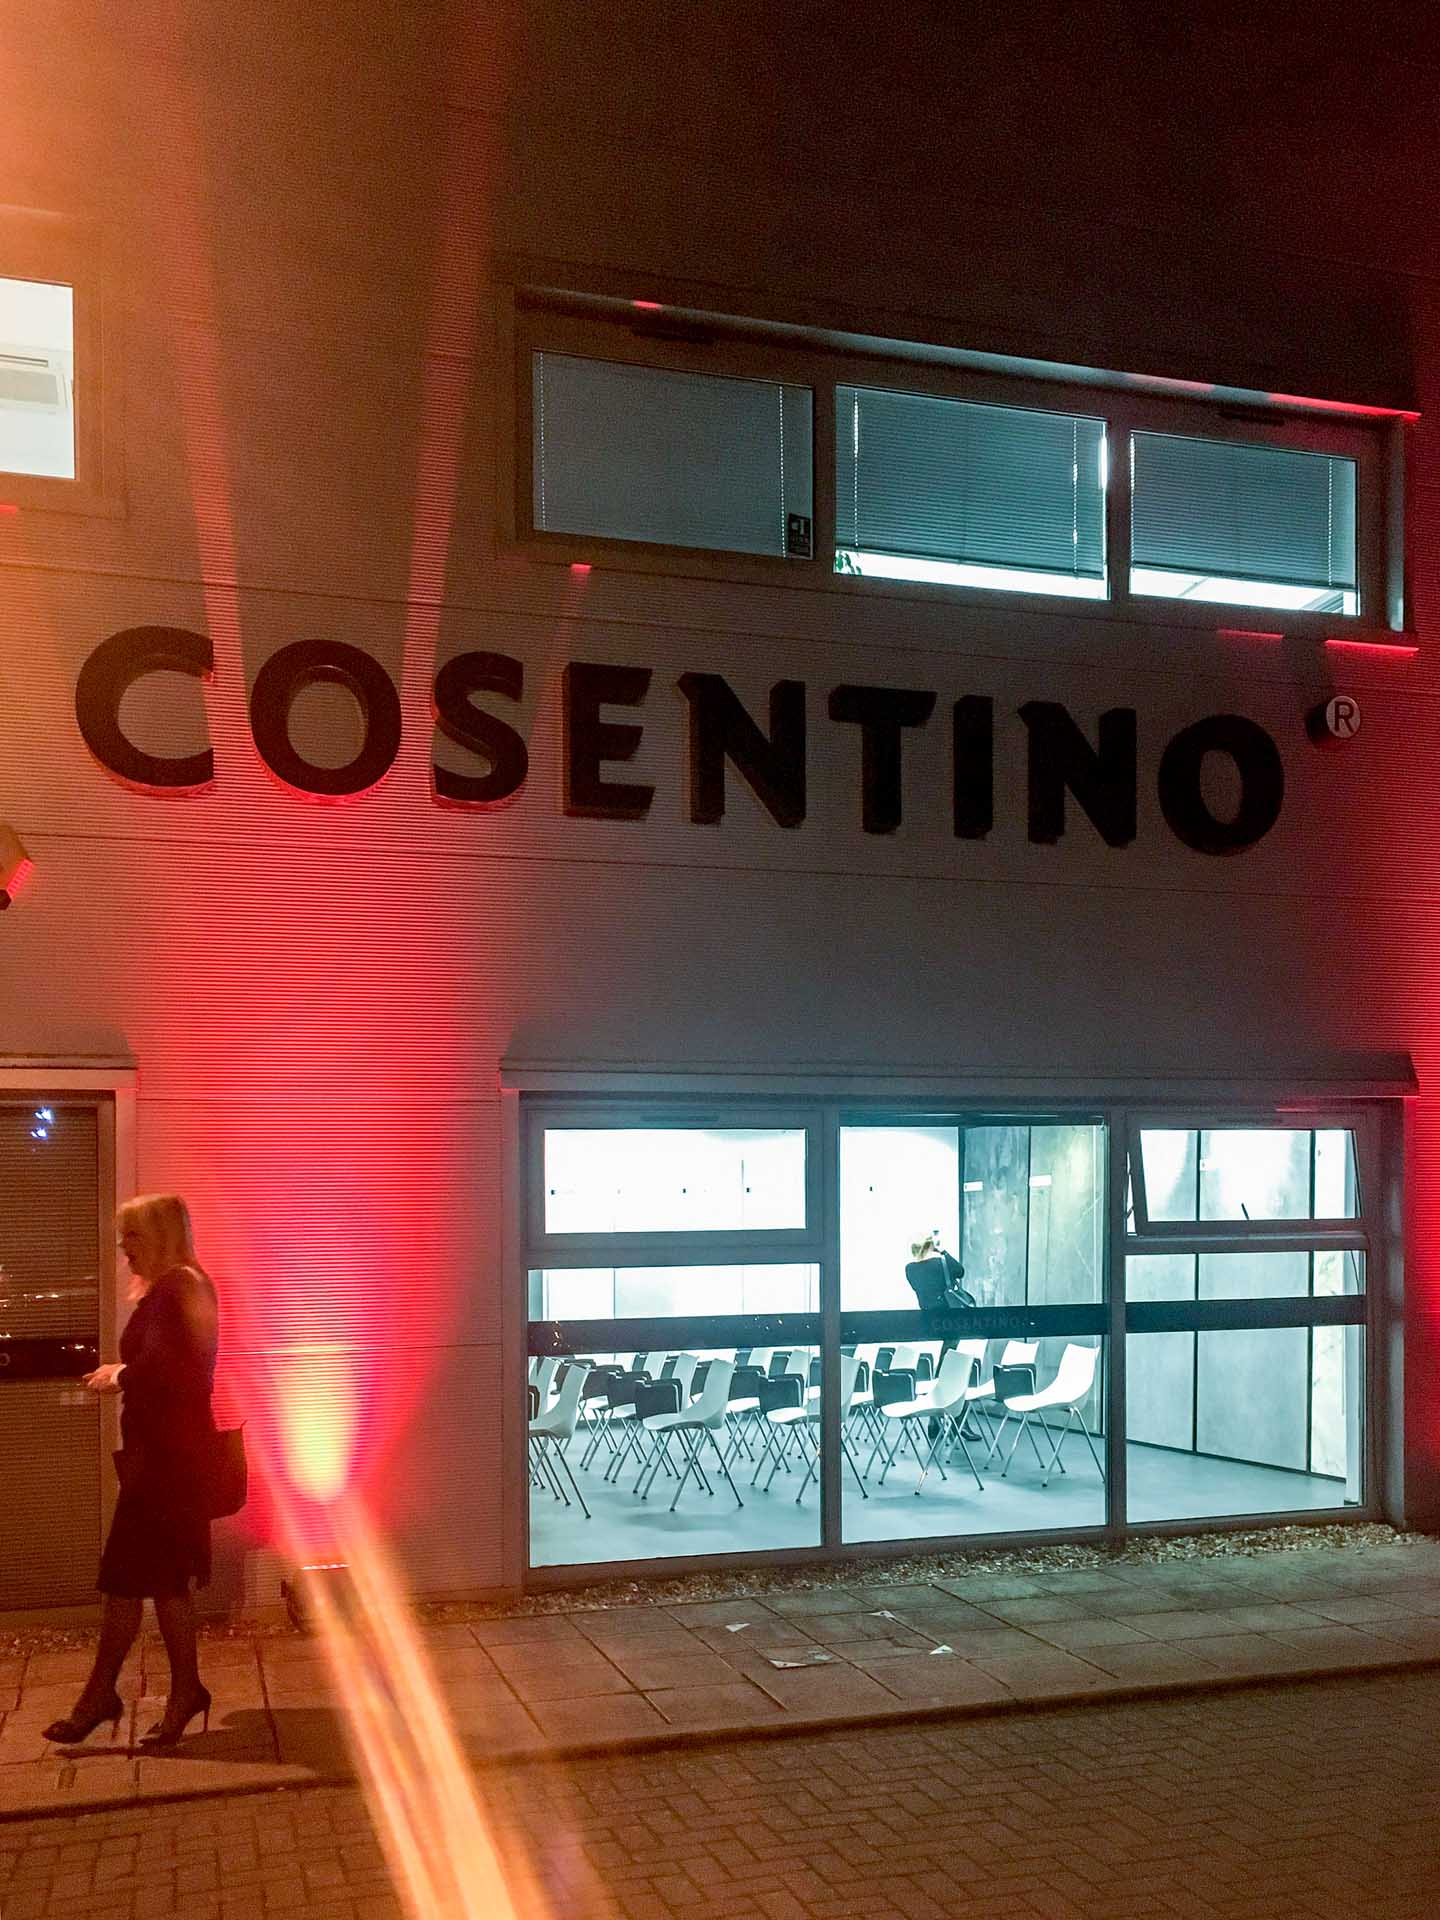 cosentino visit hook 2018 surrey quartz worktops silestone 190132 a